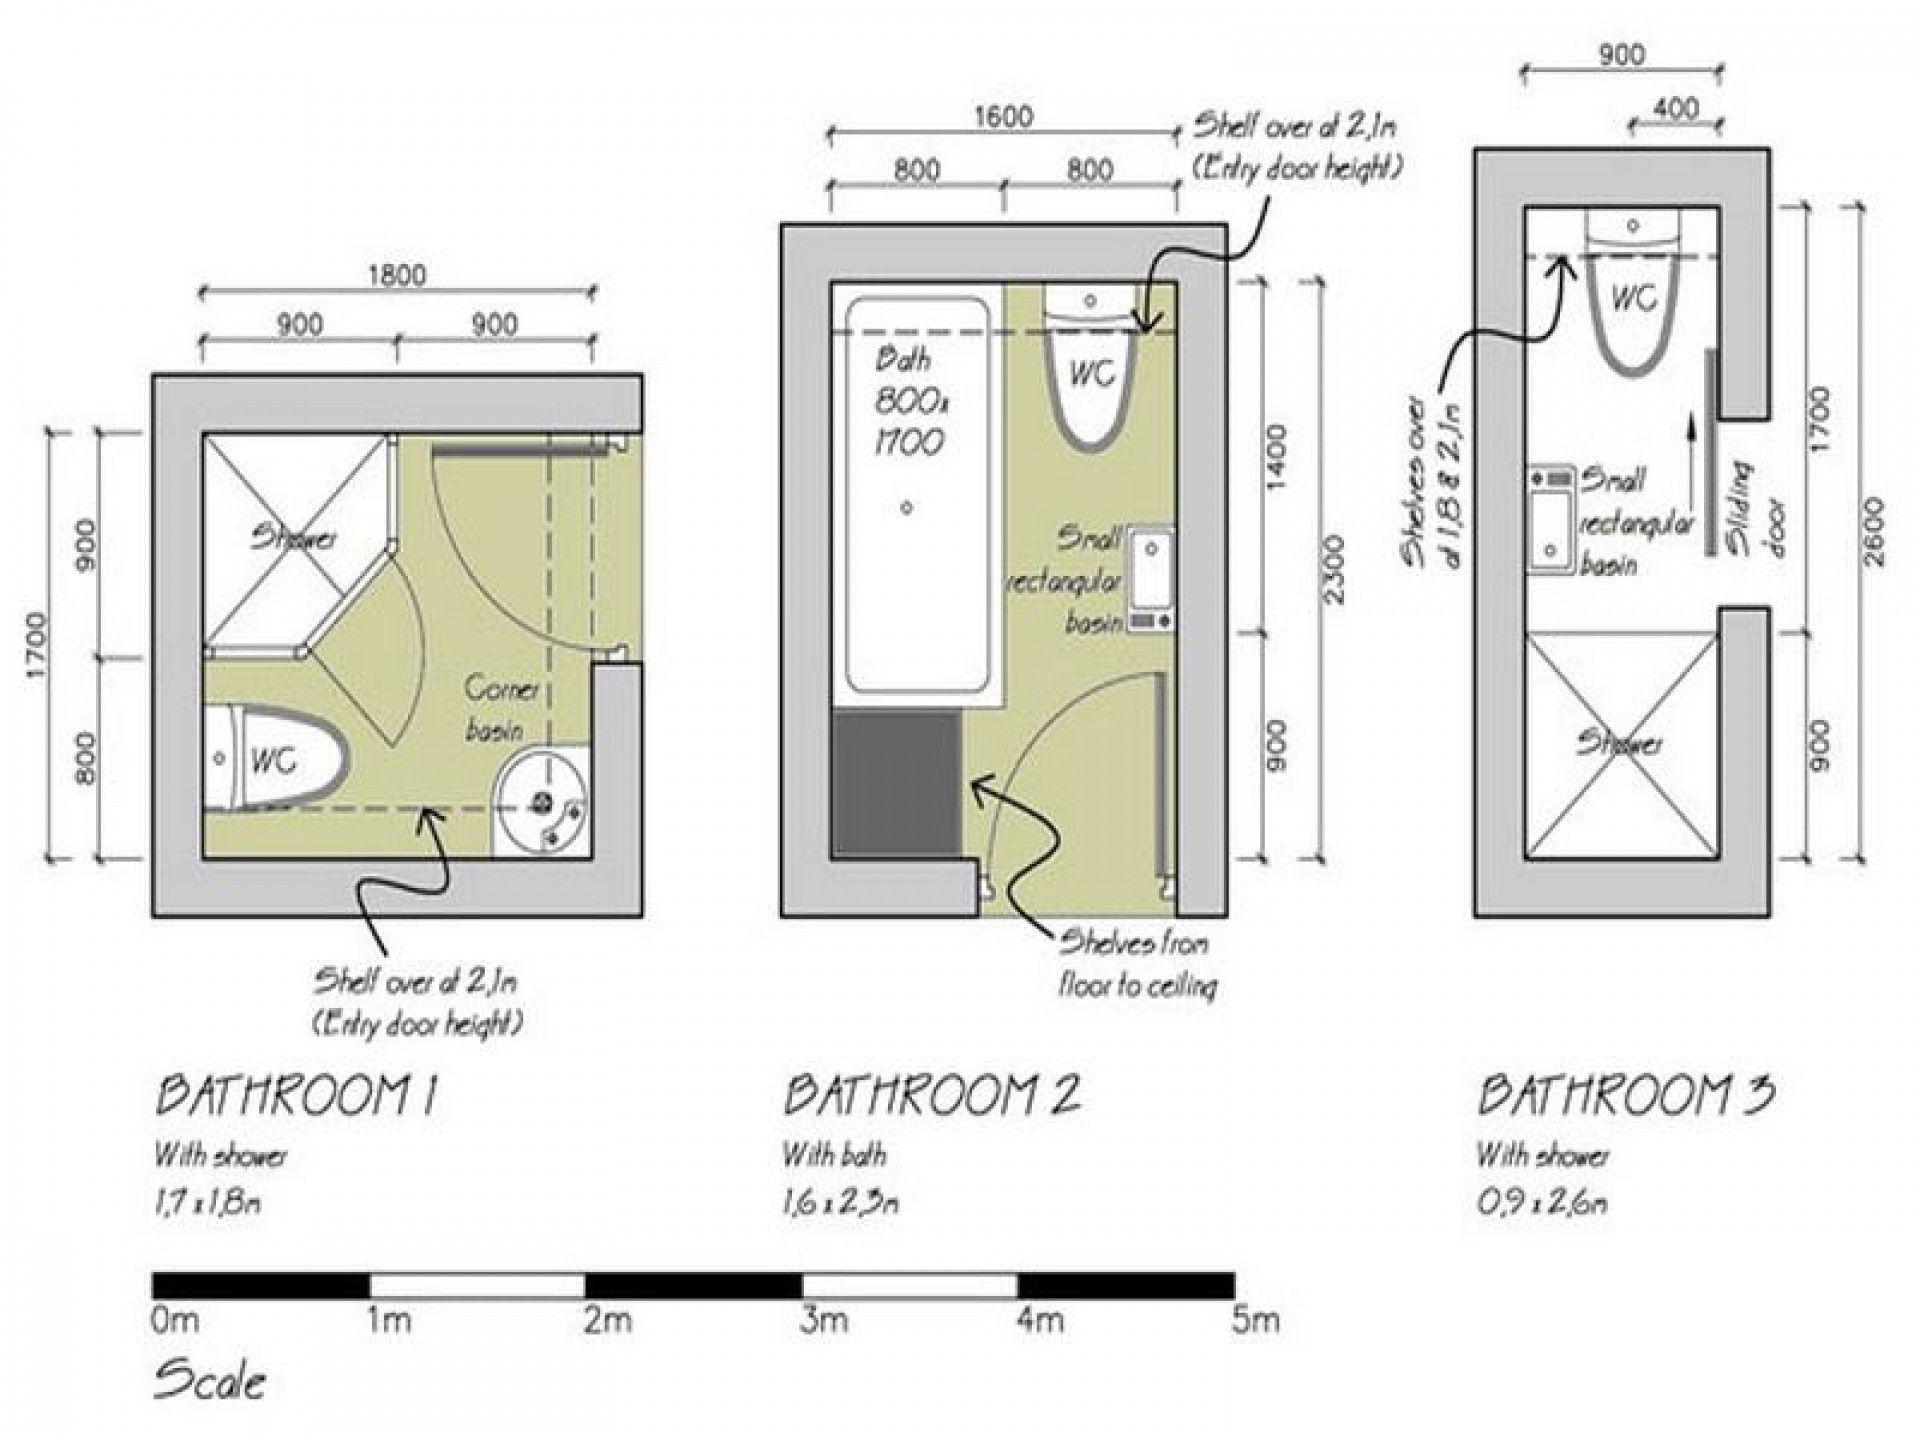 Small Bathroom Floor Plans 3ft X 9ft Small Bathroom Floor Plan From Bathroom Floor Plans Small Toilet Membangun Rumah Kamar Mandi Kecil